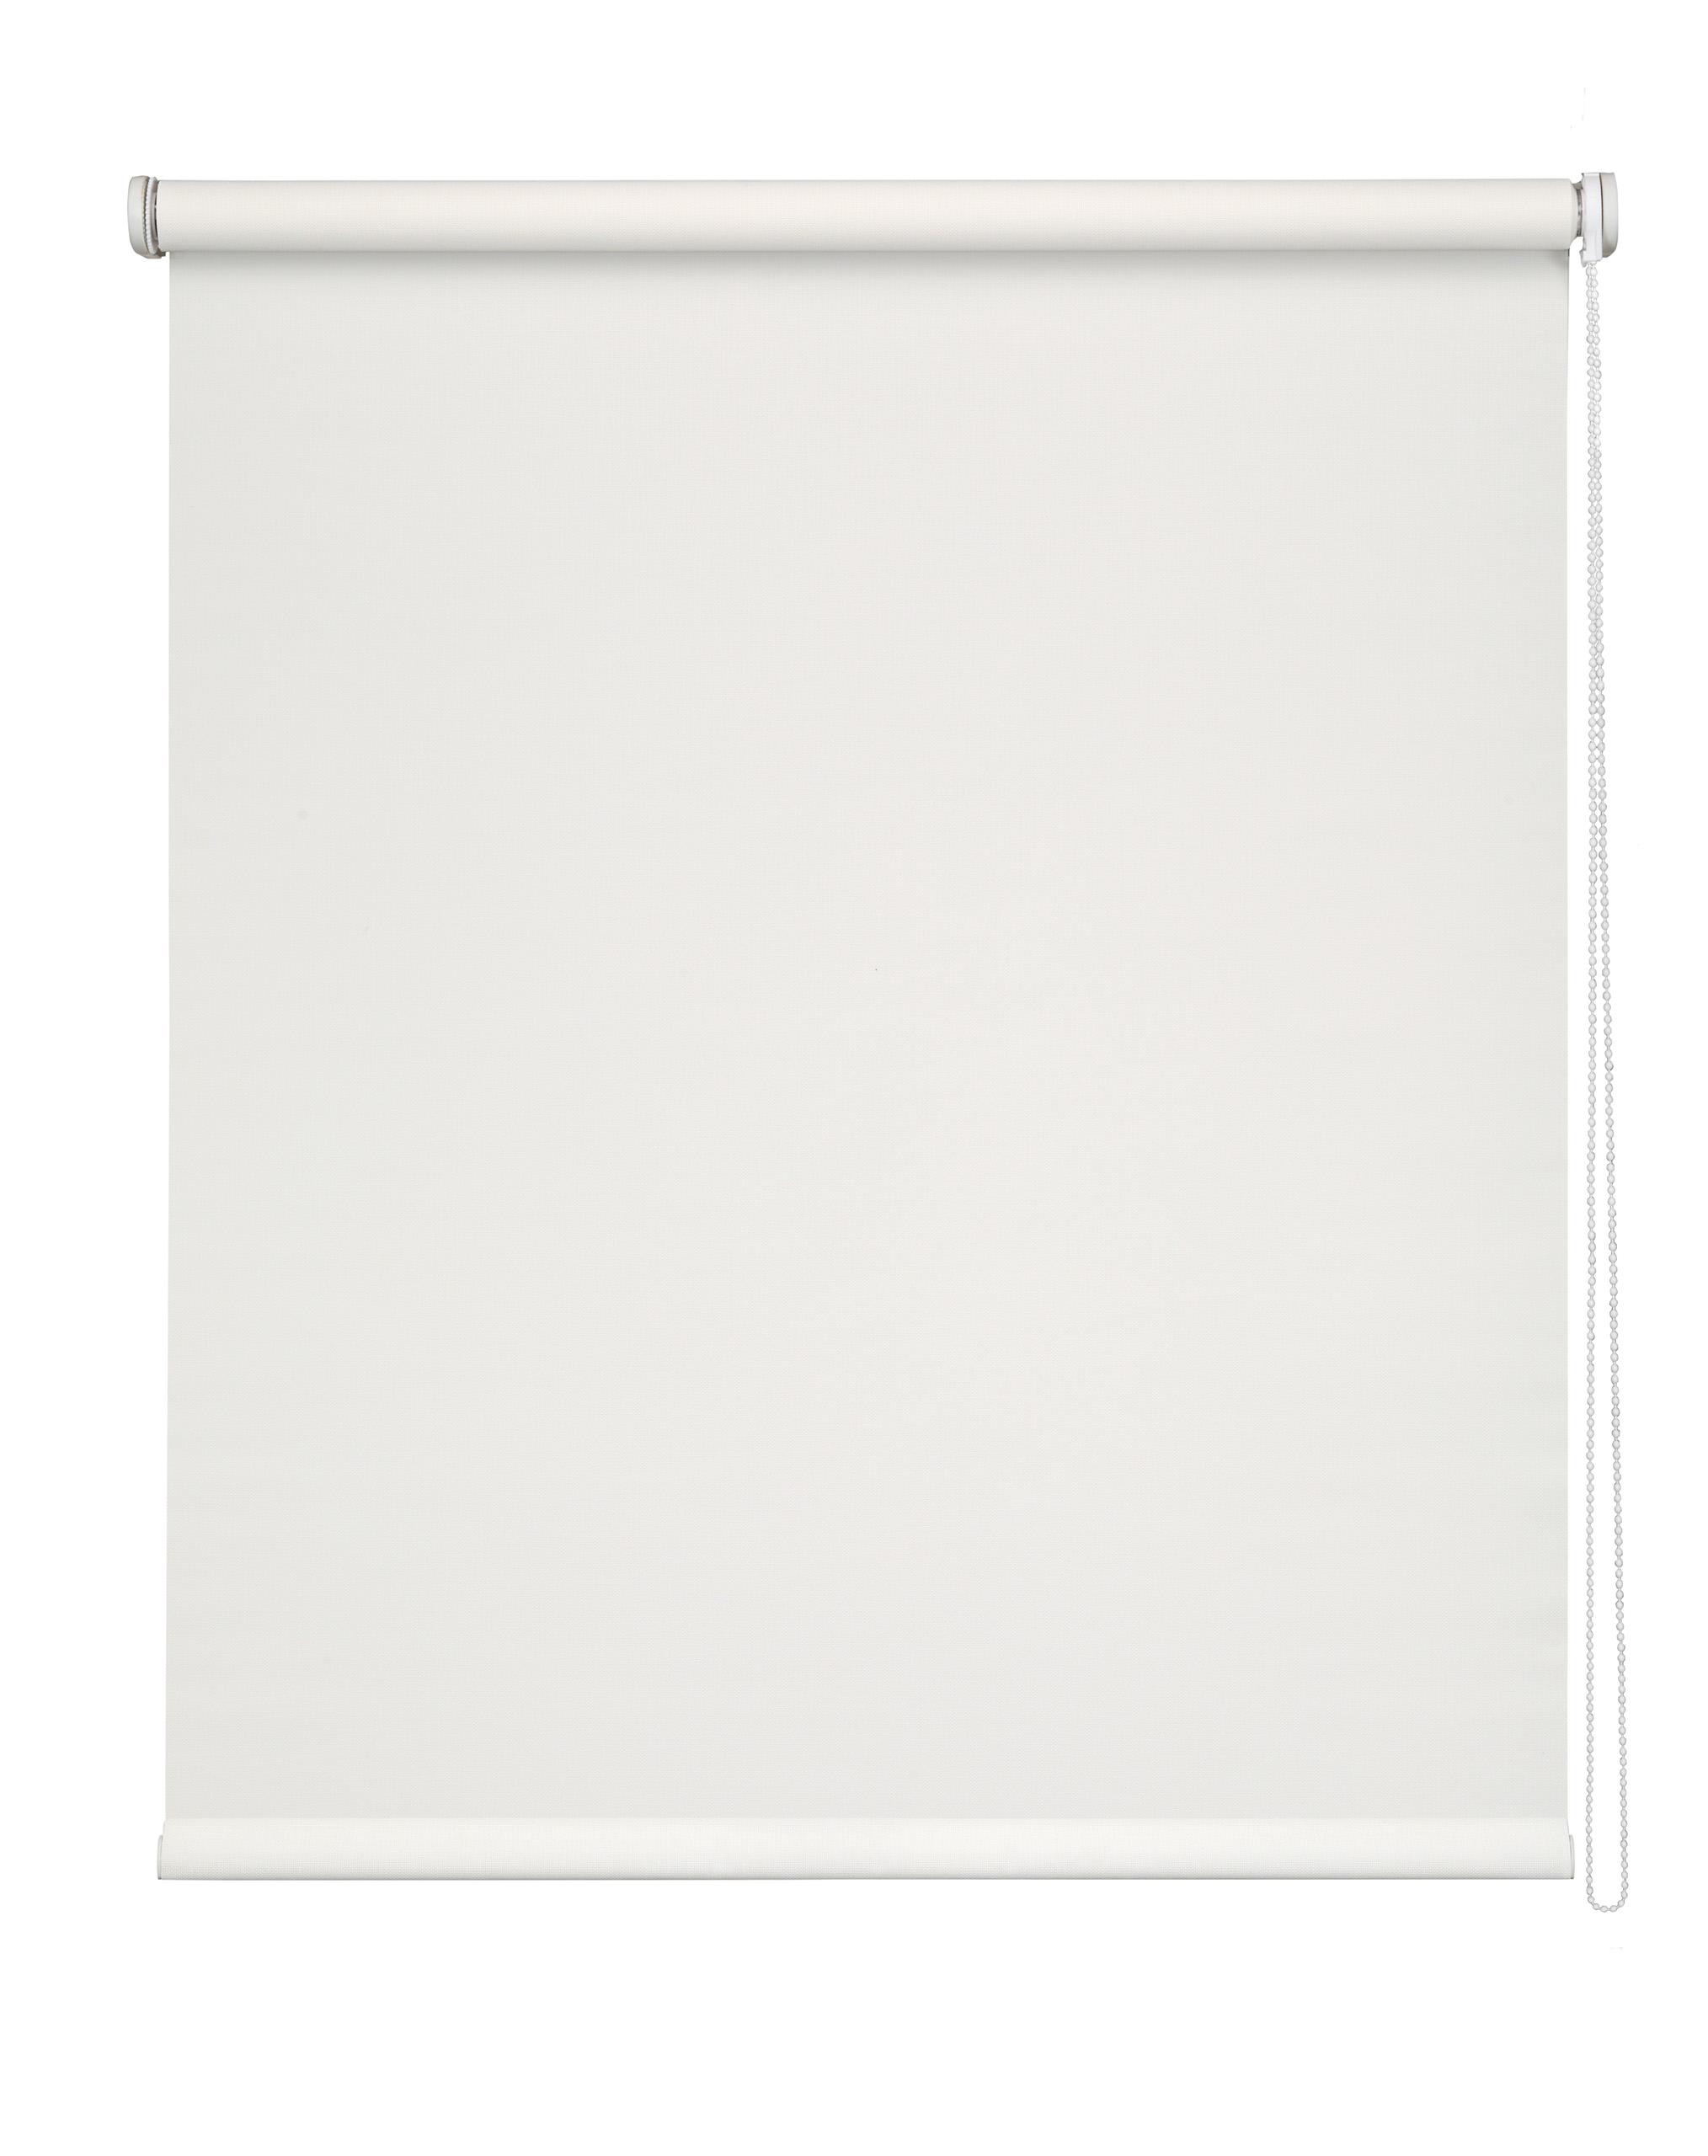 Store Enrouleur voile Screen - Blanc - 90 x 250 cm